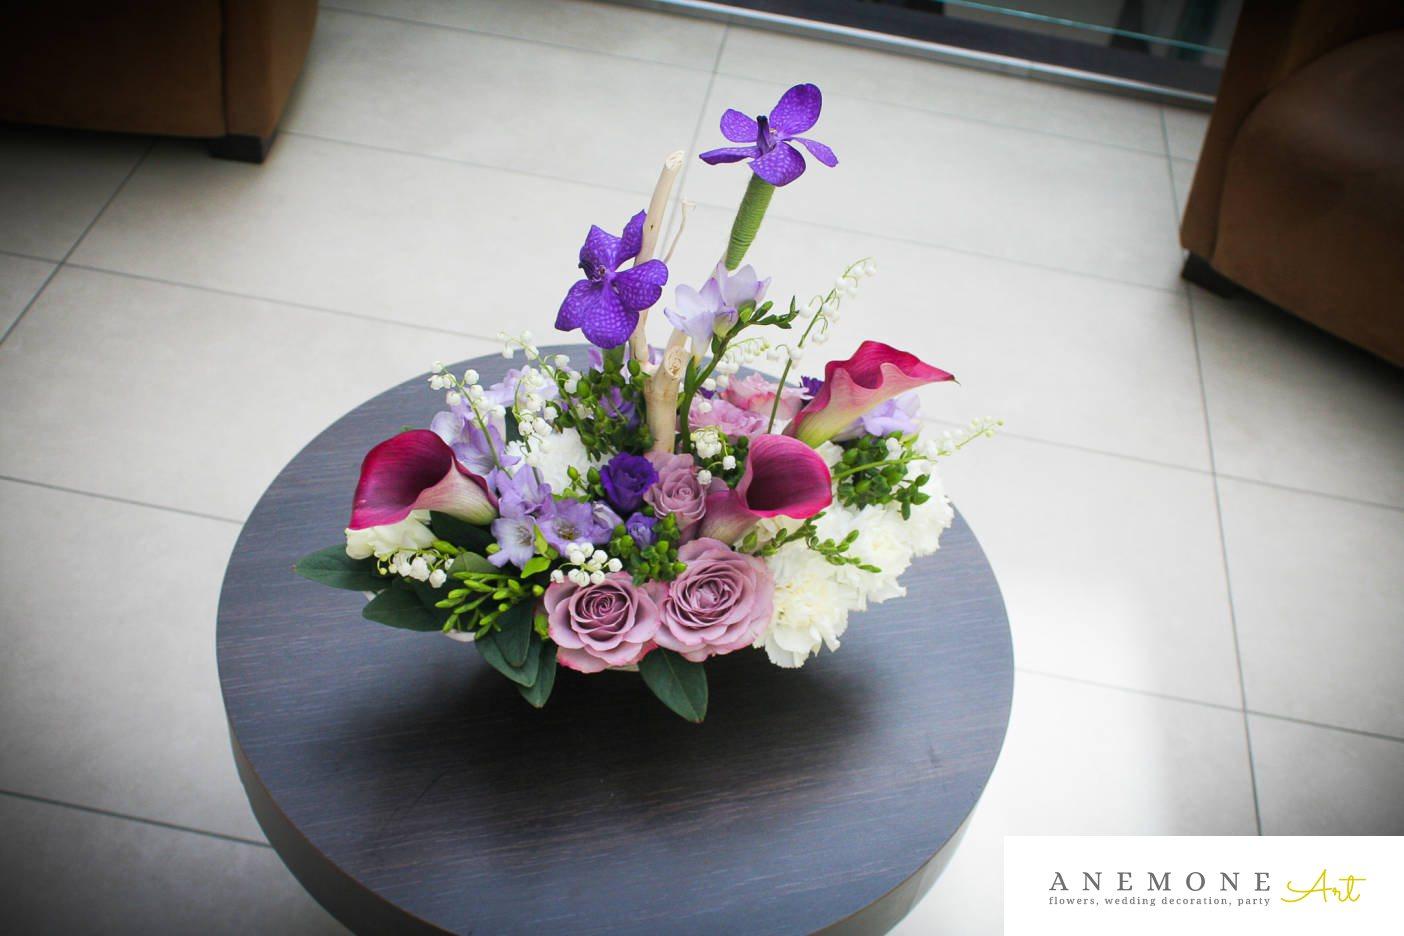 Poza, foto cu Flori de nunta calla, decor masa, frezii, lacramioare, lisianthus, multicolor, orhidee, trandafiri in Arad, Timisoara, Oradea (wedding flowers, bouquets) nunta Arad, Timisoara, Oradea